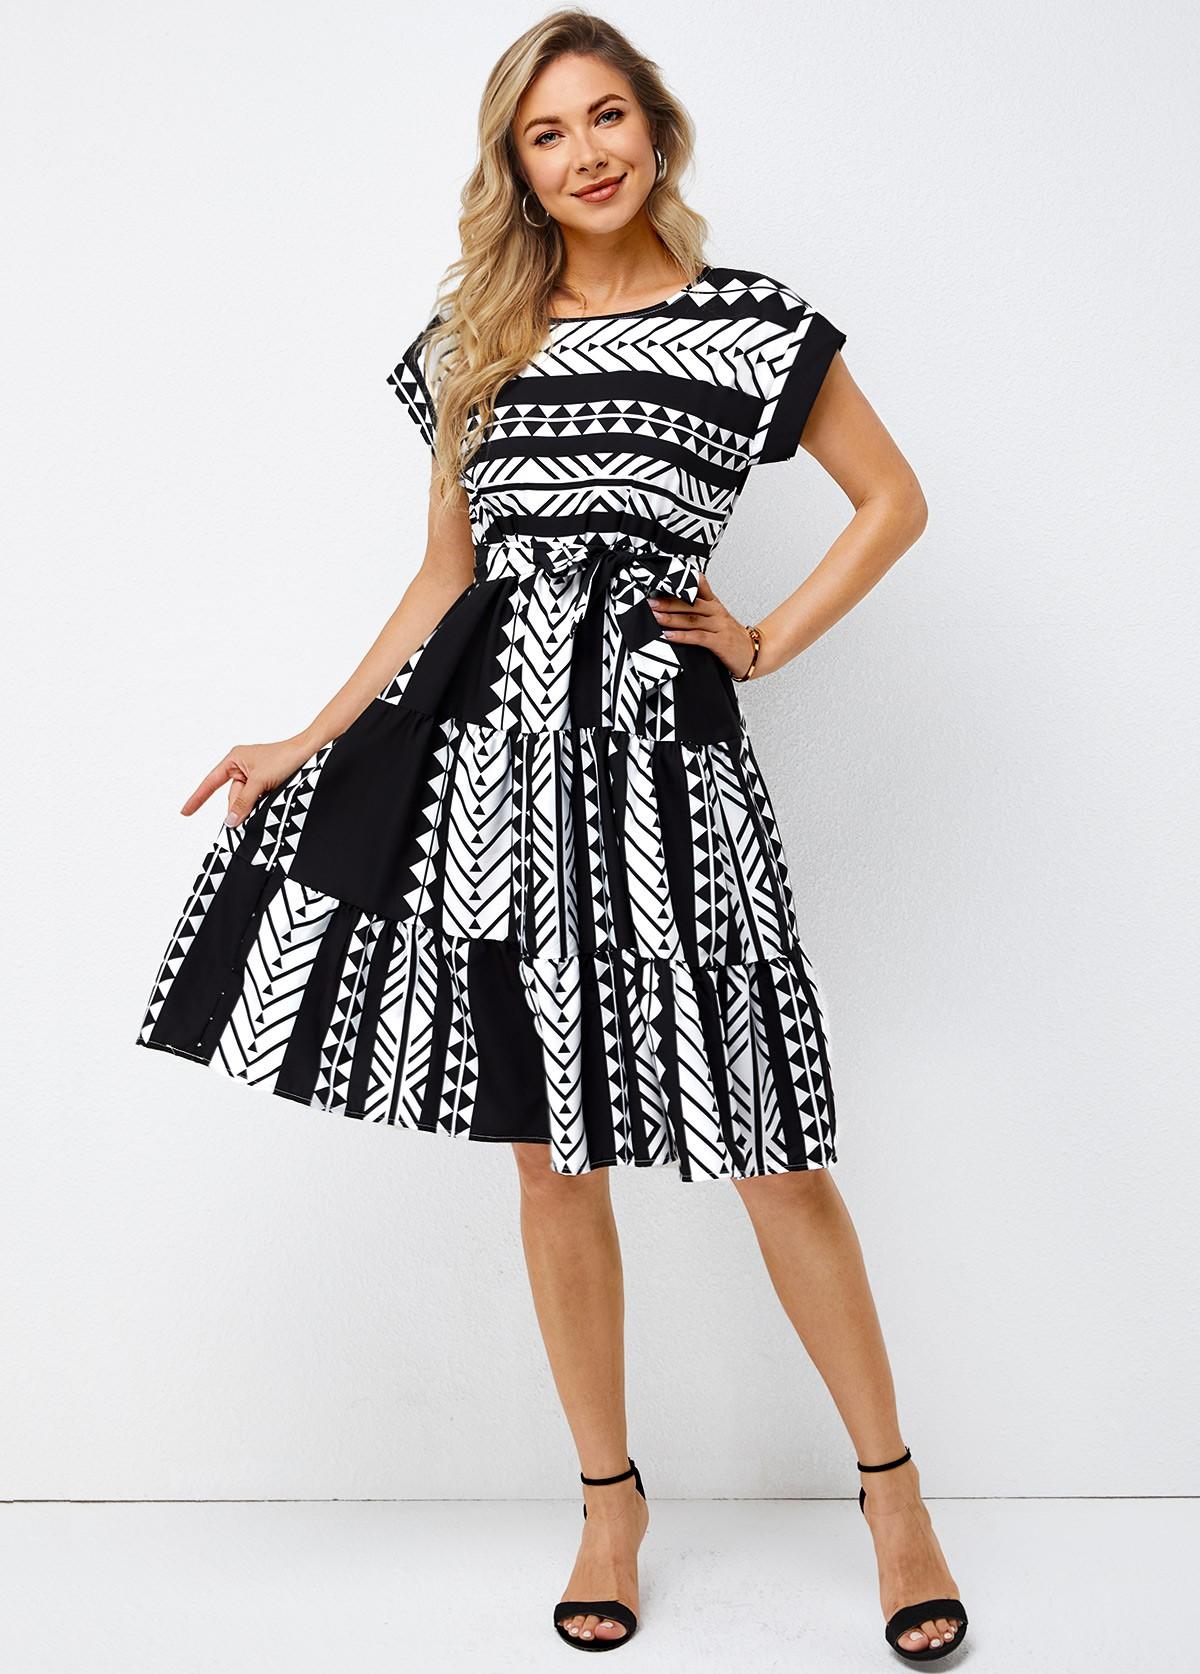 Belted Geometric Print Short Sleeve Round Neck Dress